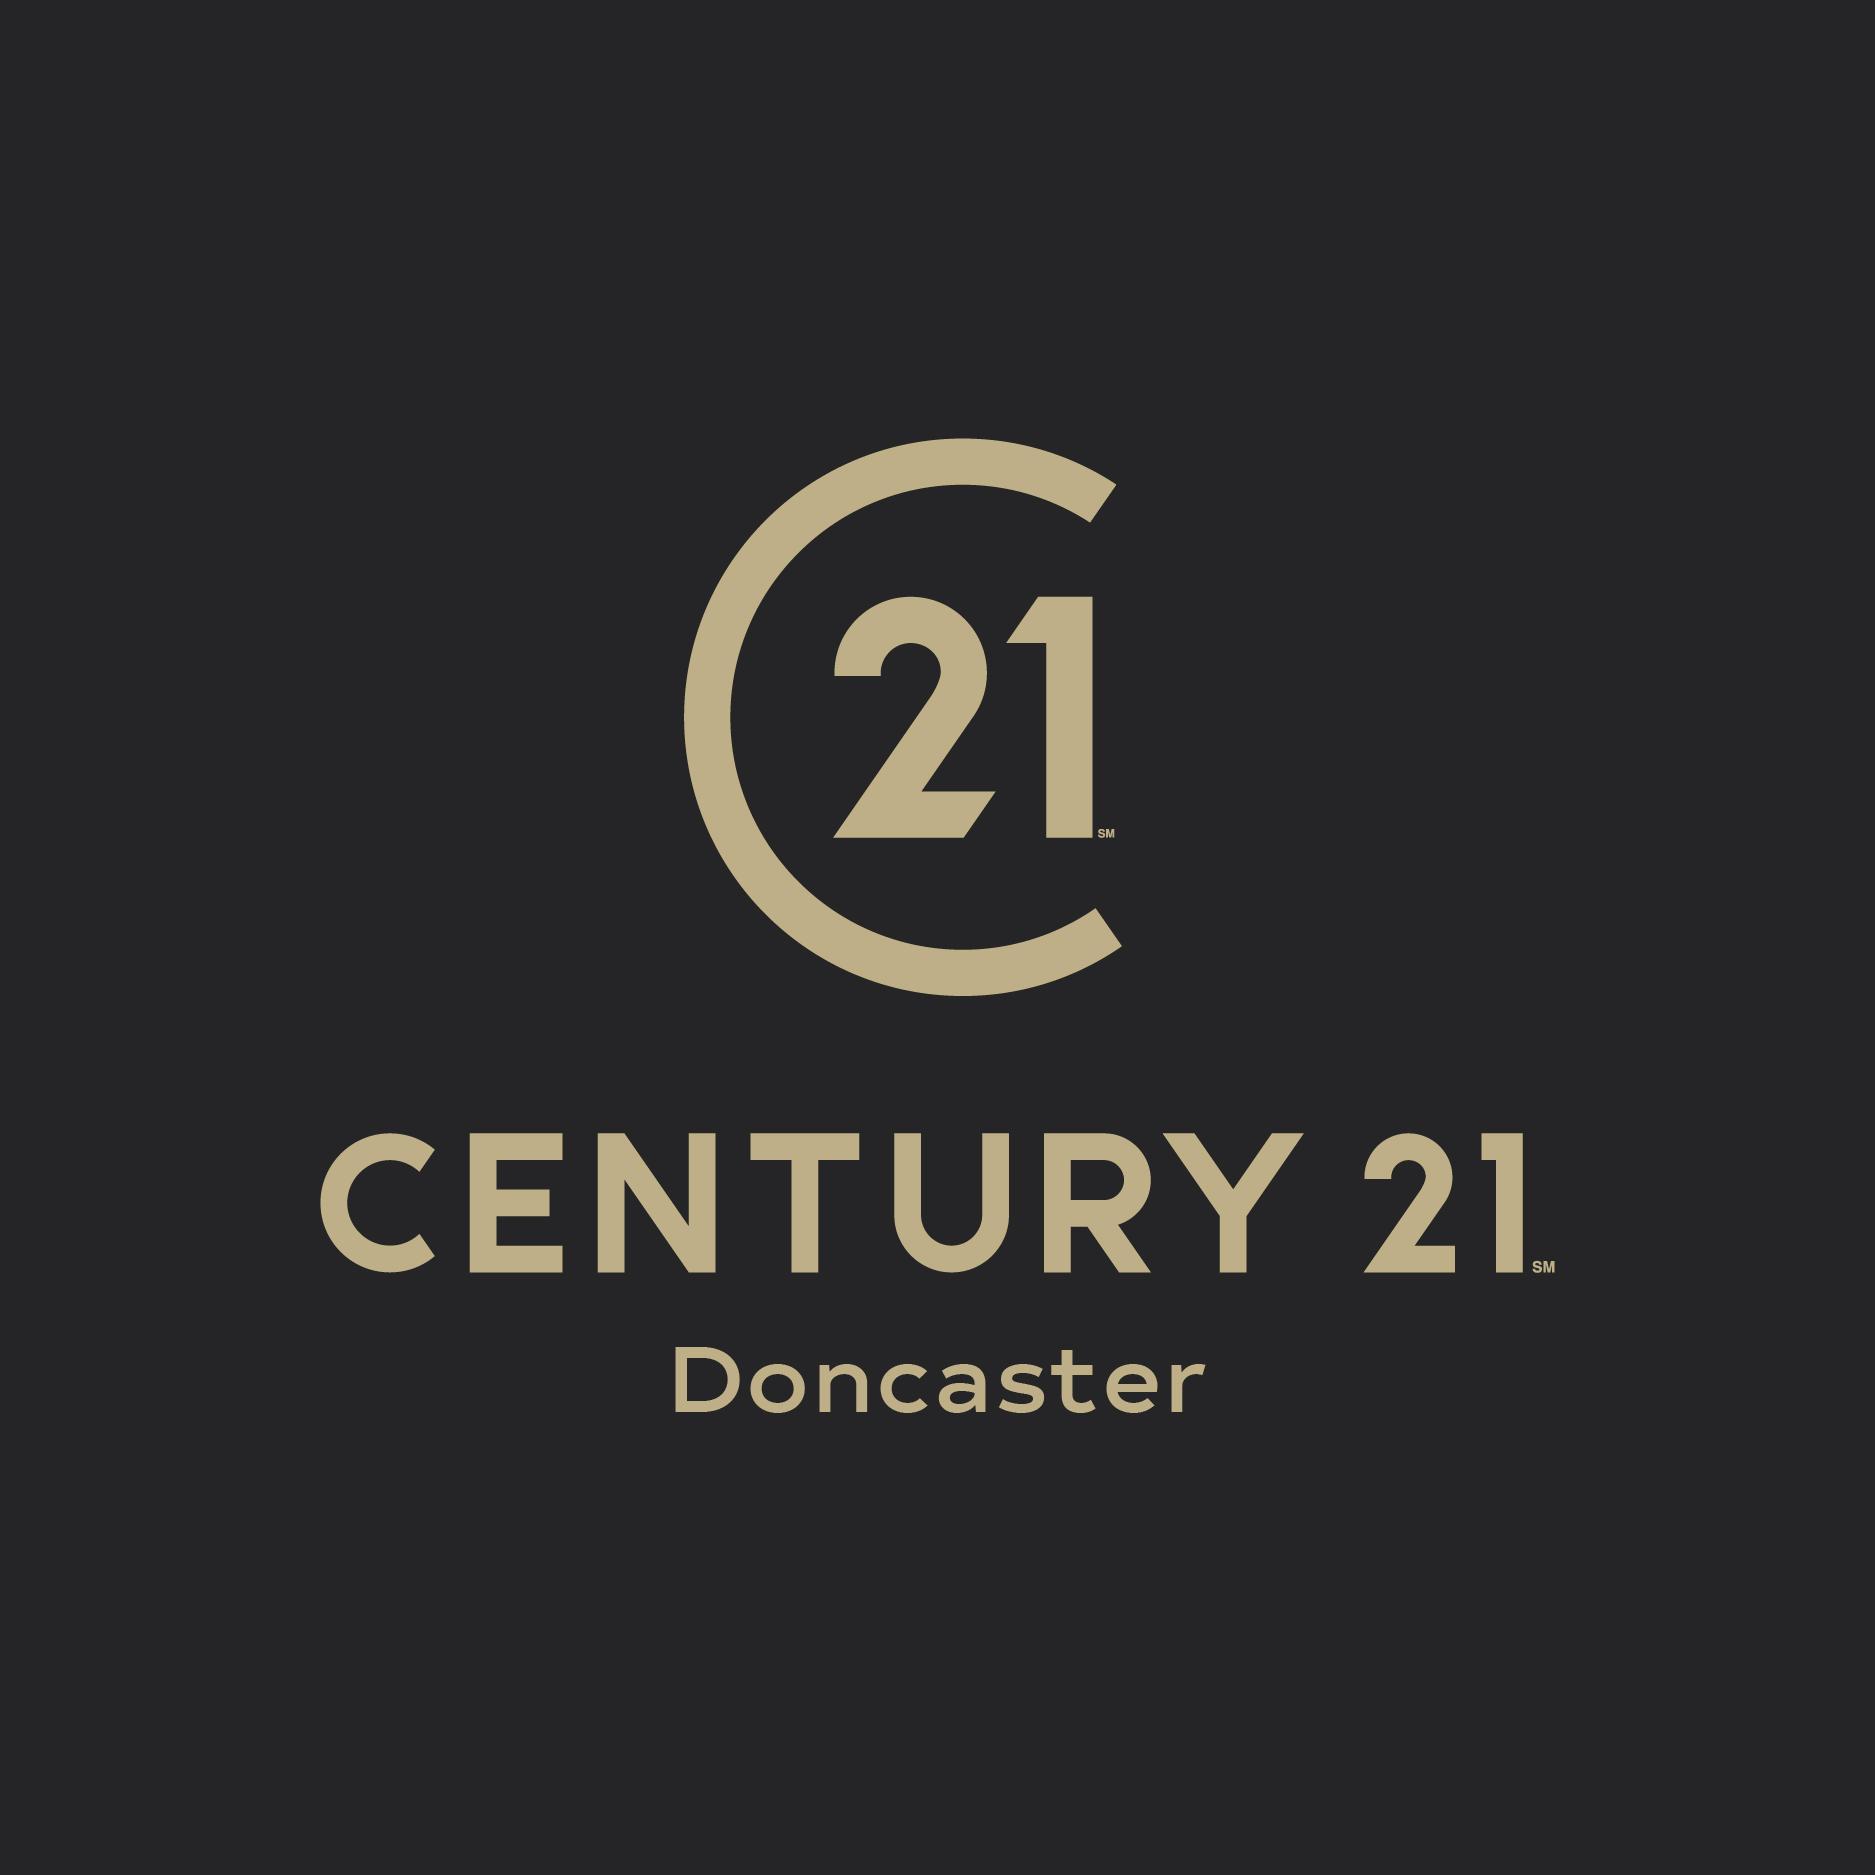 Century 21 - Doncaster